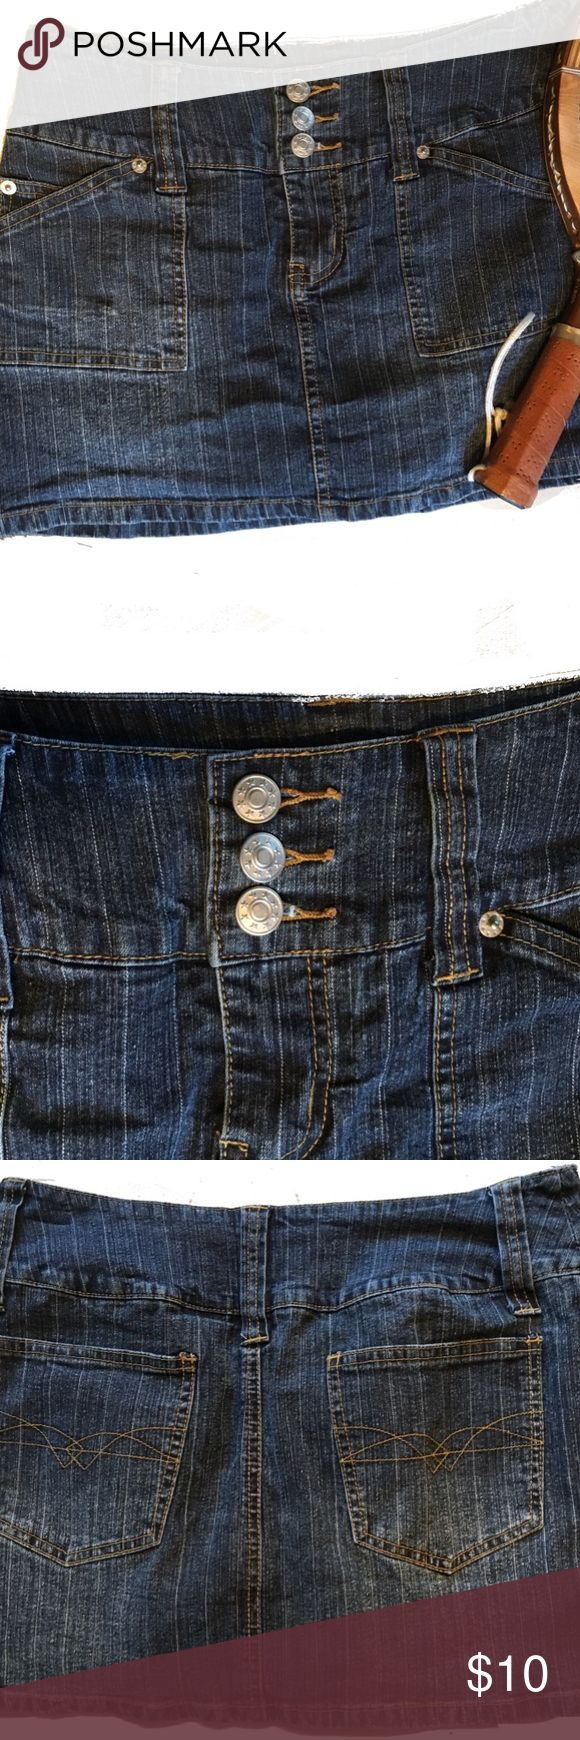 Rave super cute SKORT Great condition skort. 55% ramie 27% cotton 16%polyester 2% spandex Rave 4 Real Shorts Skorts